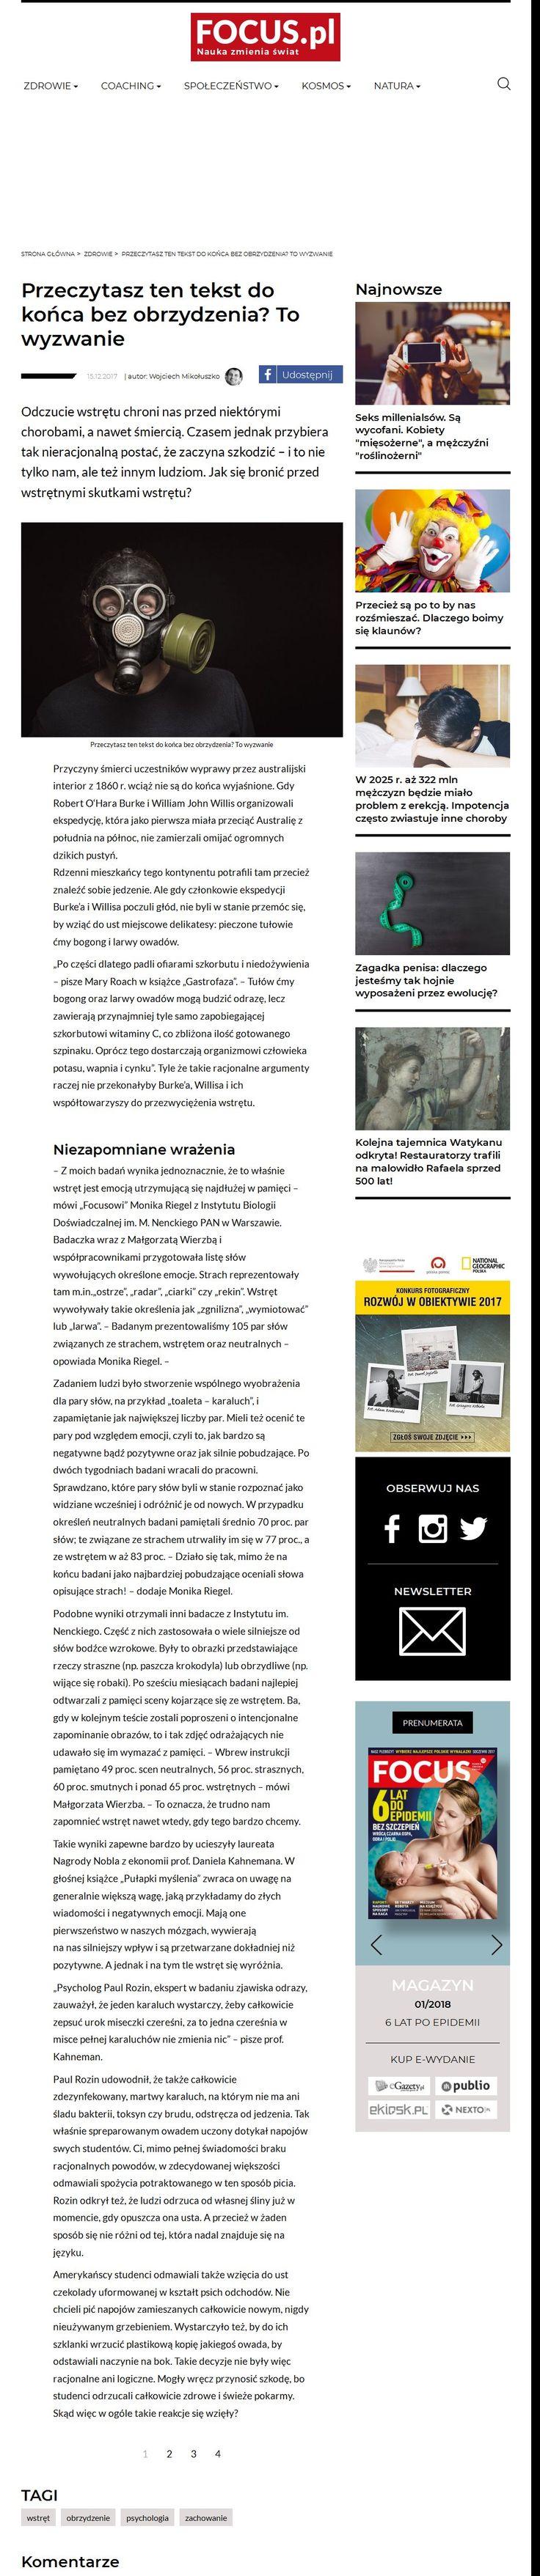 http://nencki.inforia.net/przeglad.php?mode=podglad&id2=198309858